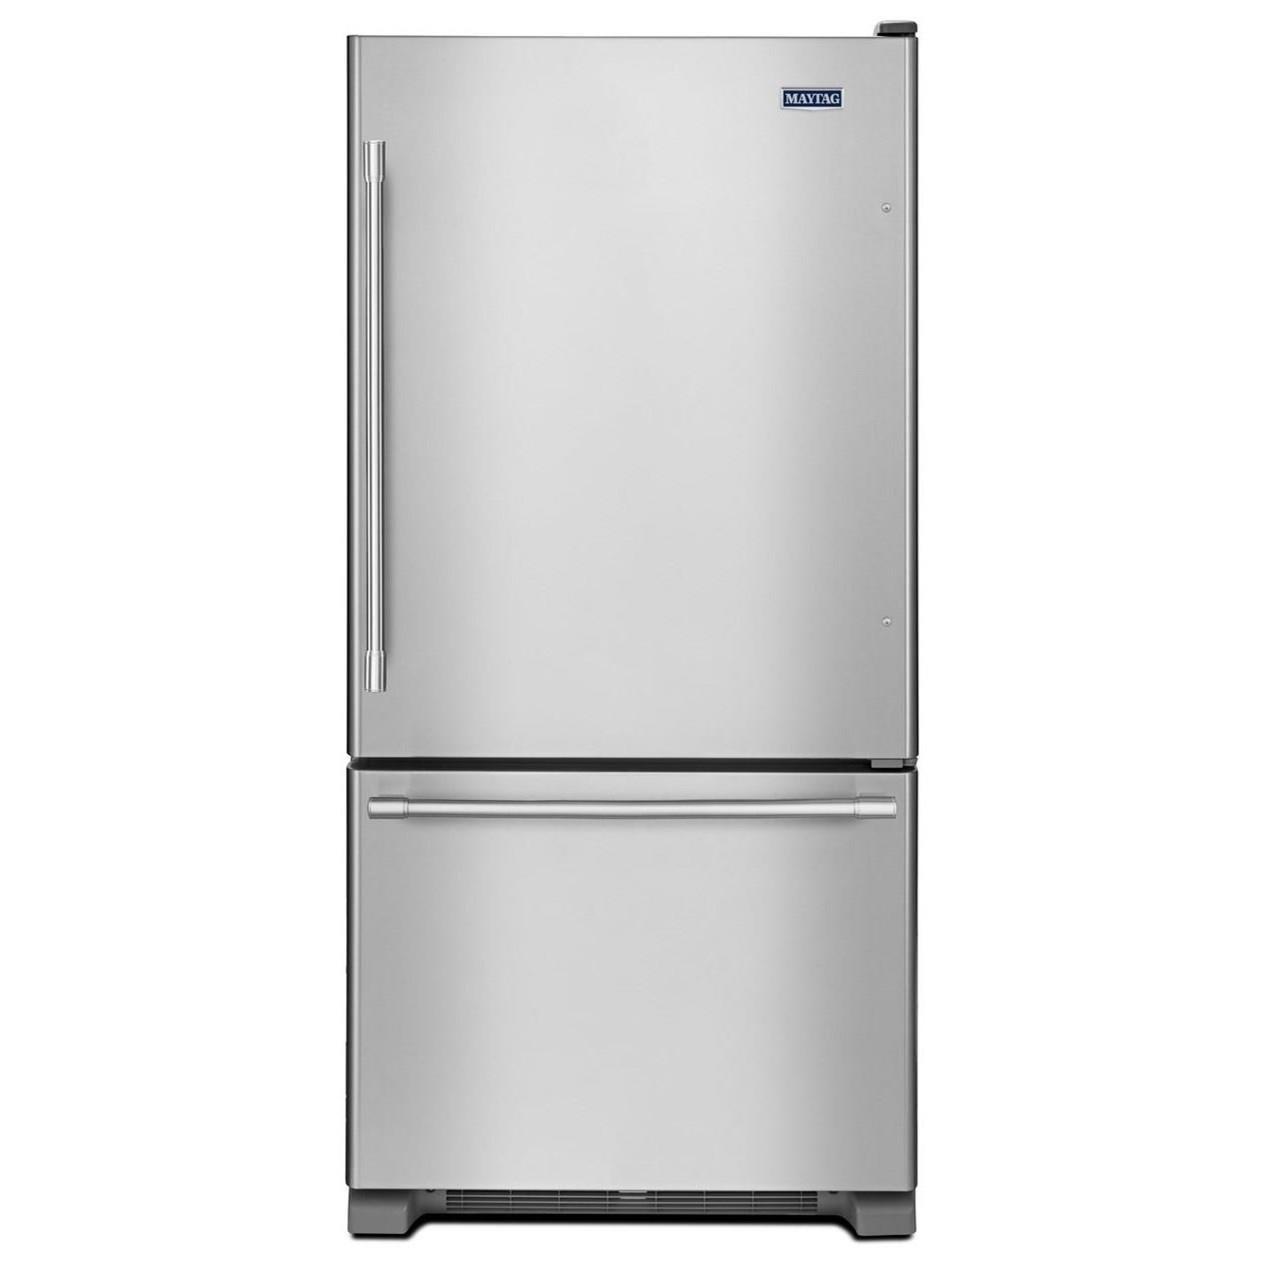 Maytag Bottom Freezer Refrigerators - Maytag 33-Inch 22 Cu. Ft. Bottom Mount Refrigerator - Item Number: MBF2258FEZ